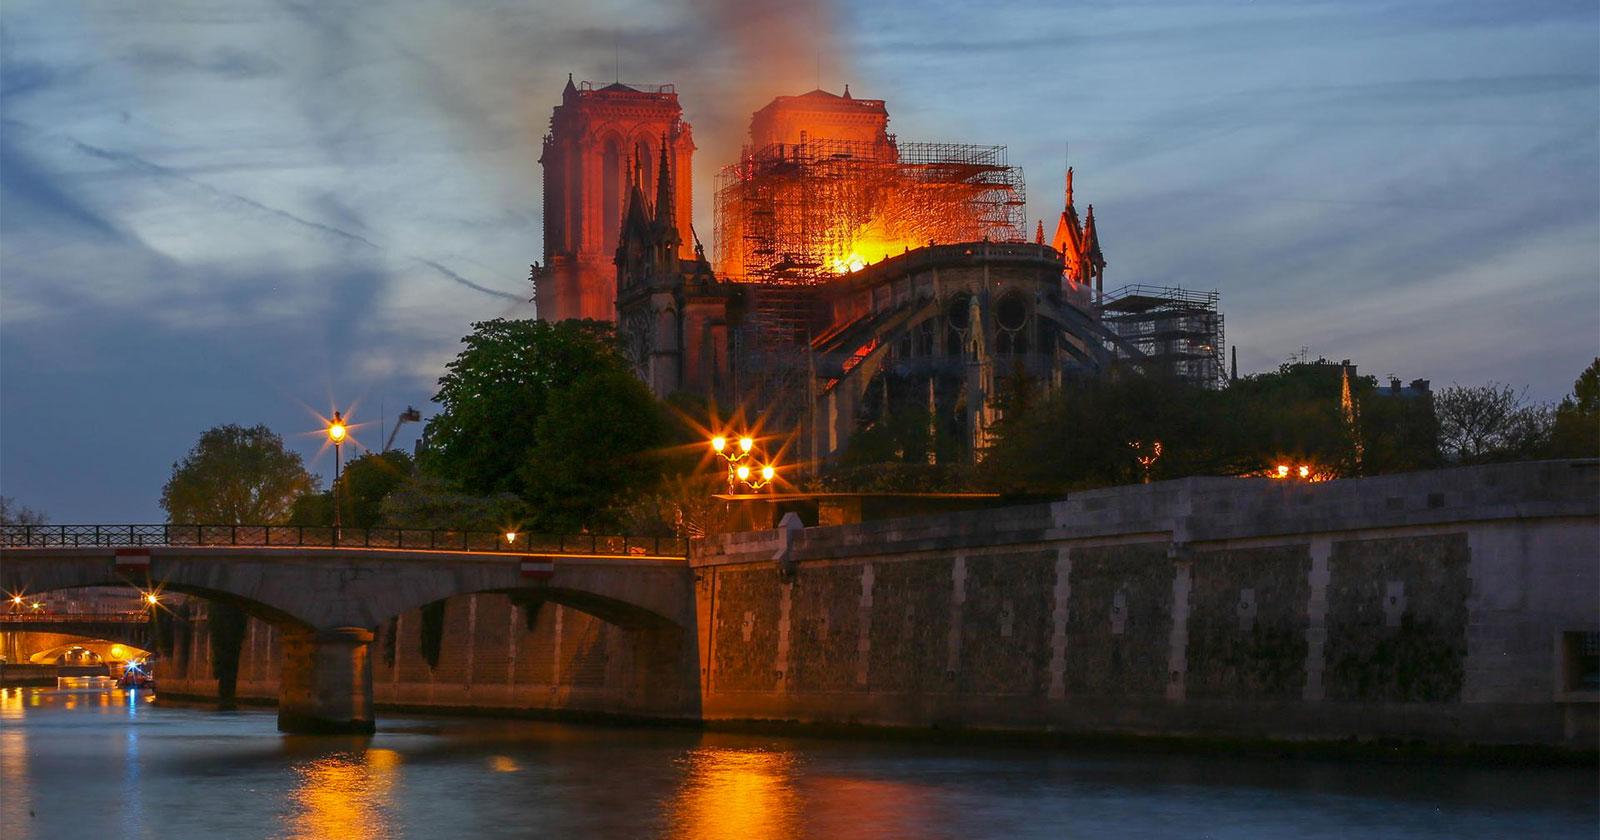 Salvaguardia del patrimonio e rischio da catastrofi: al via la summer school «After the Damages»